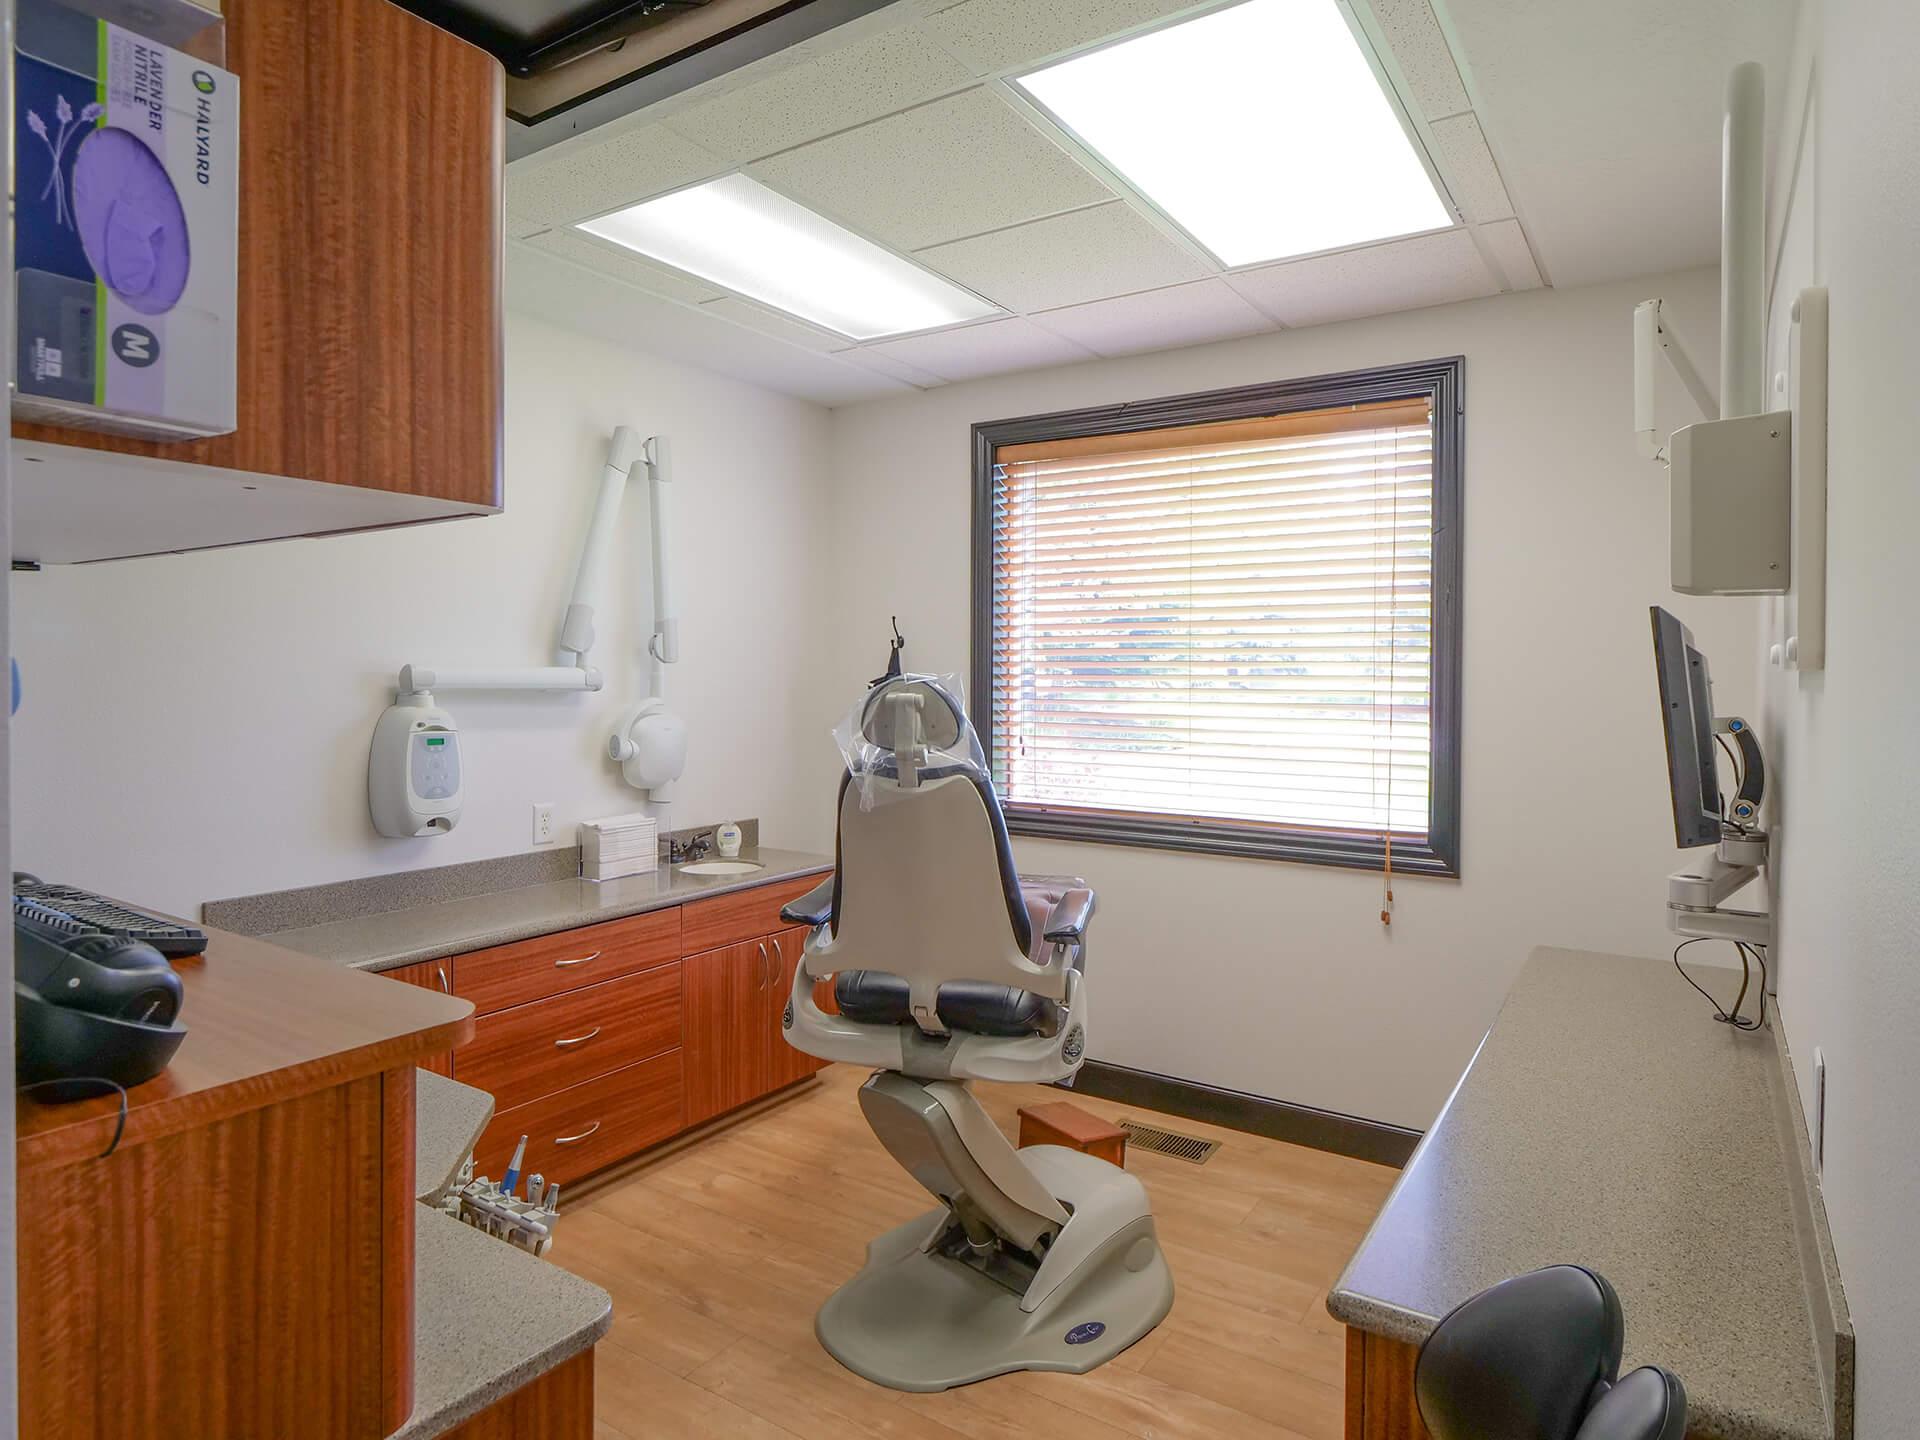 Aesthetic Smiles Office Photo-5